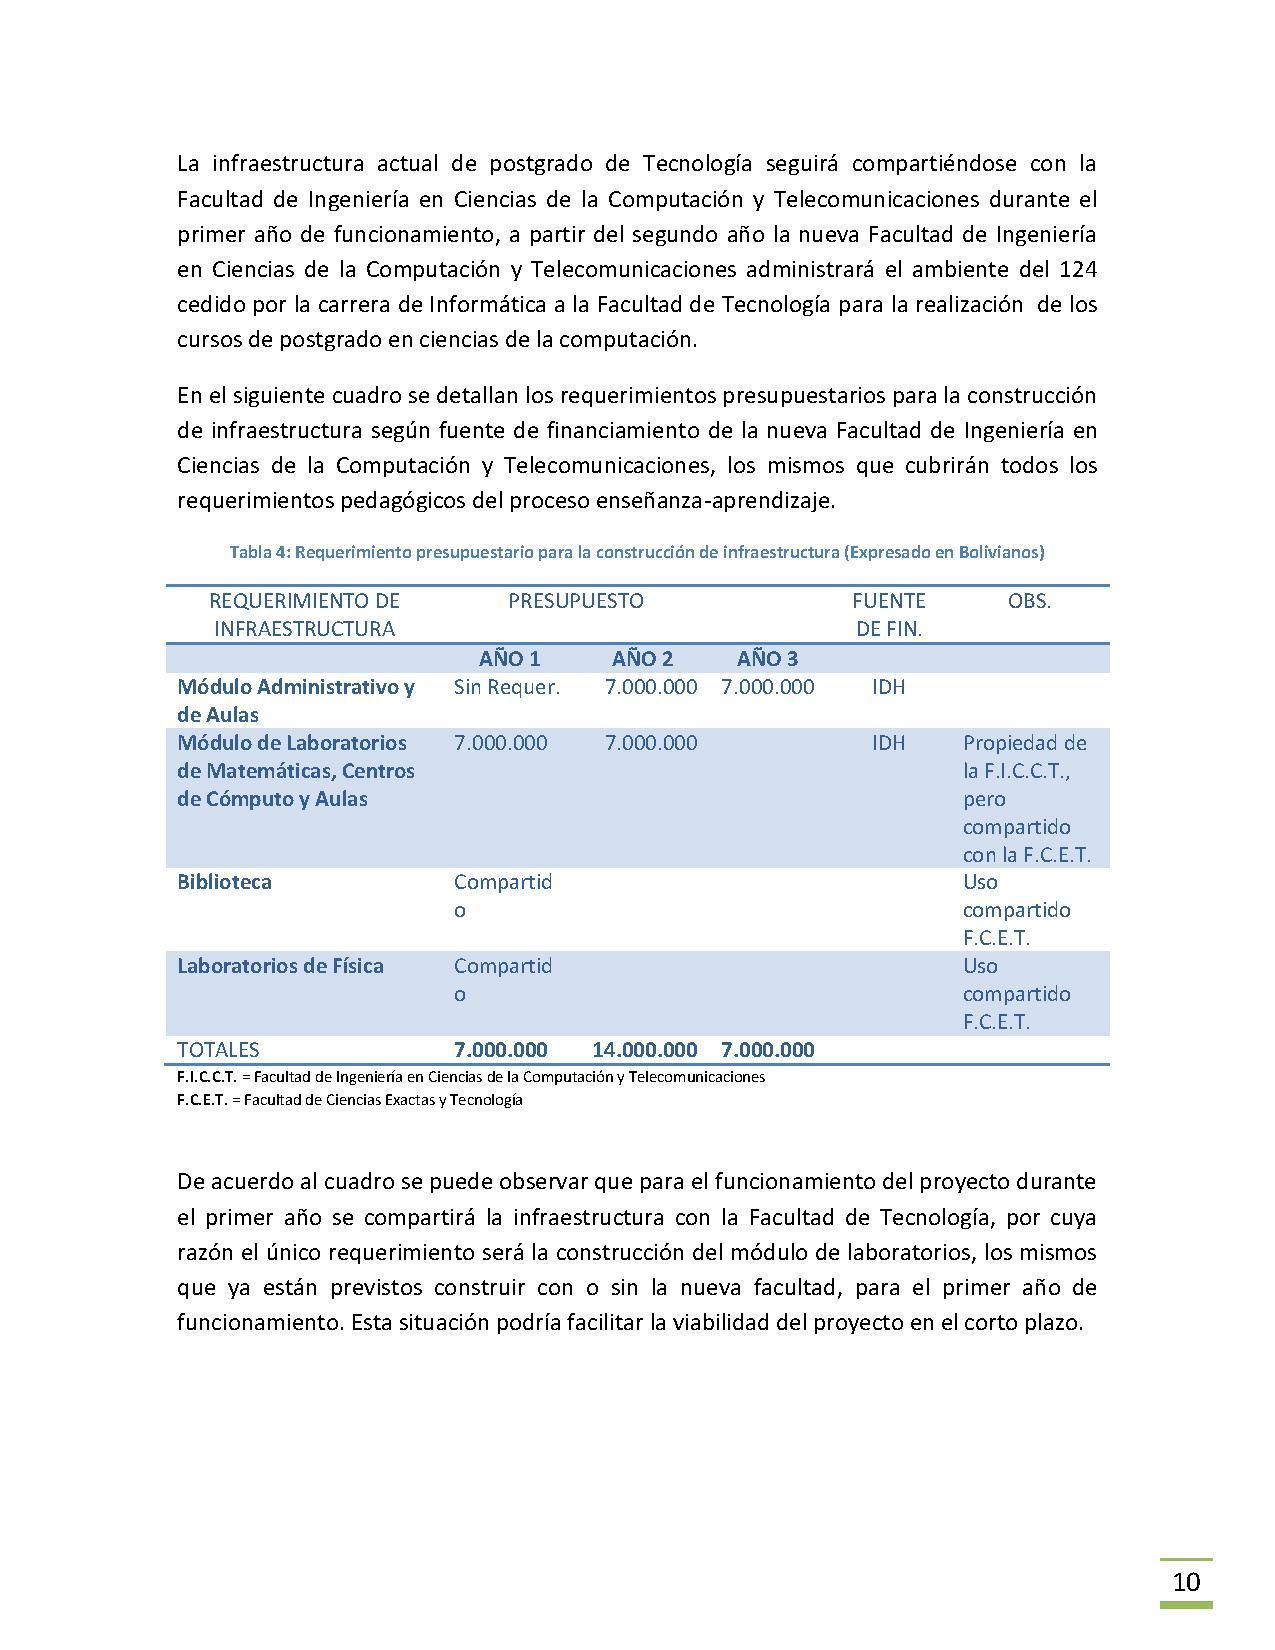 File Plan De Viabilidad Ficct Pdf Wikipedia